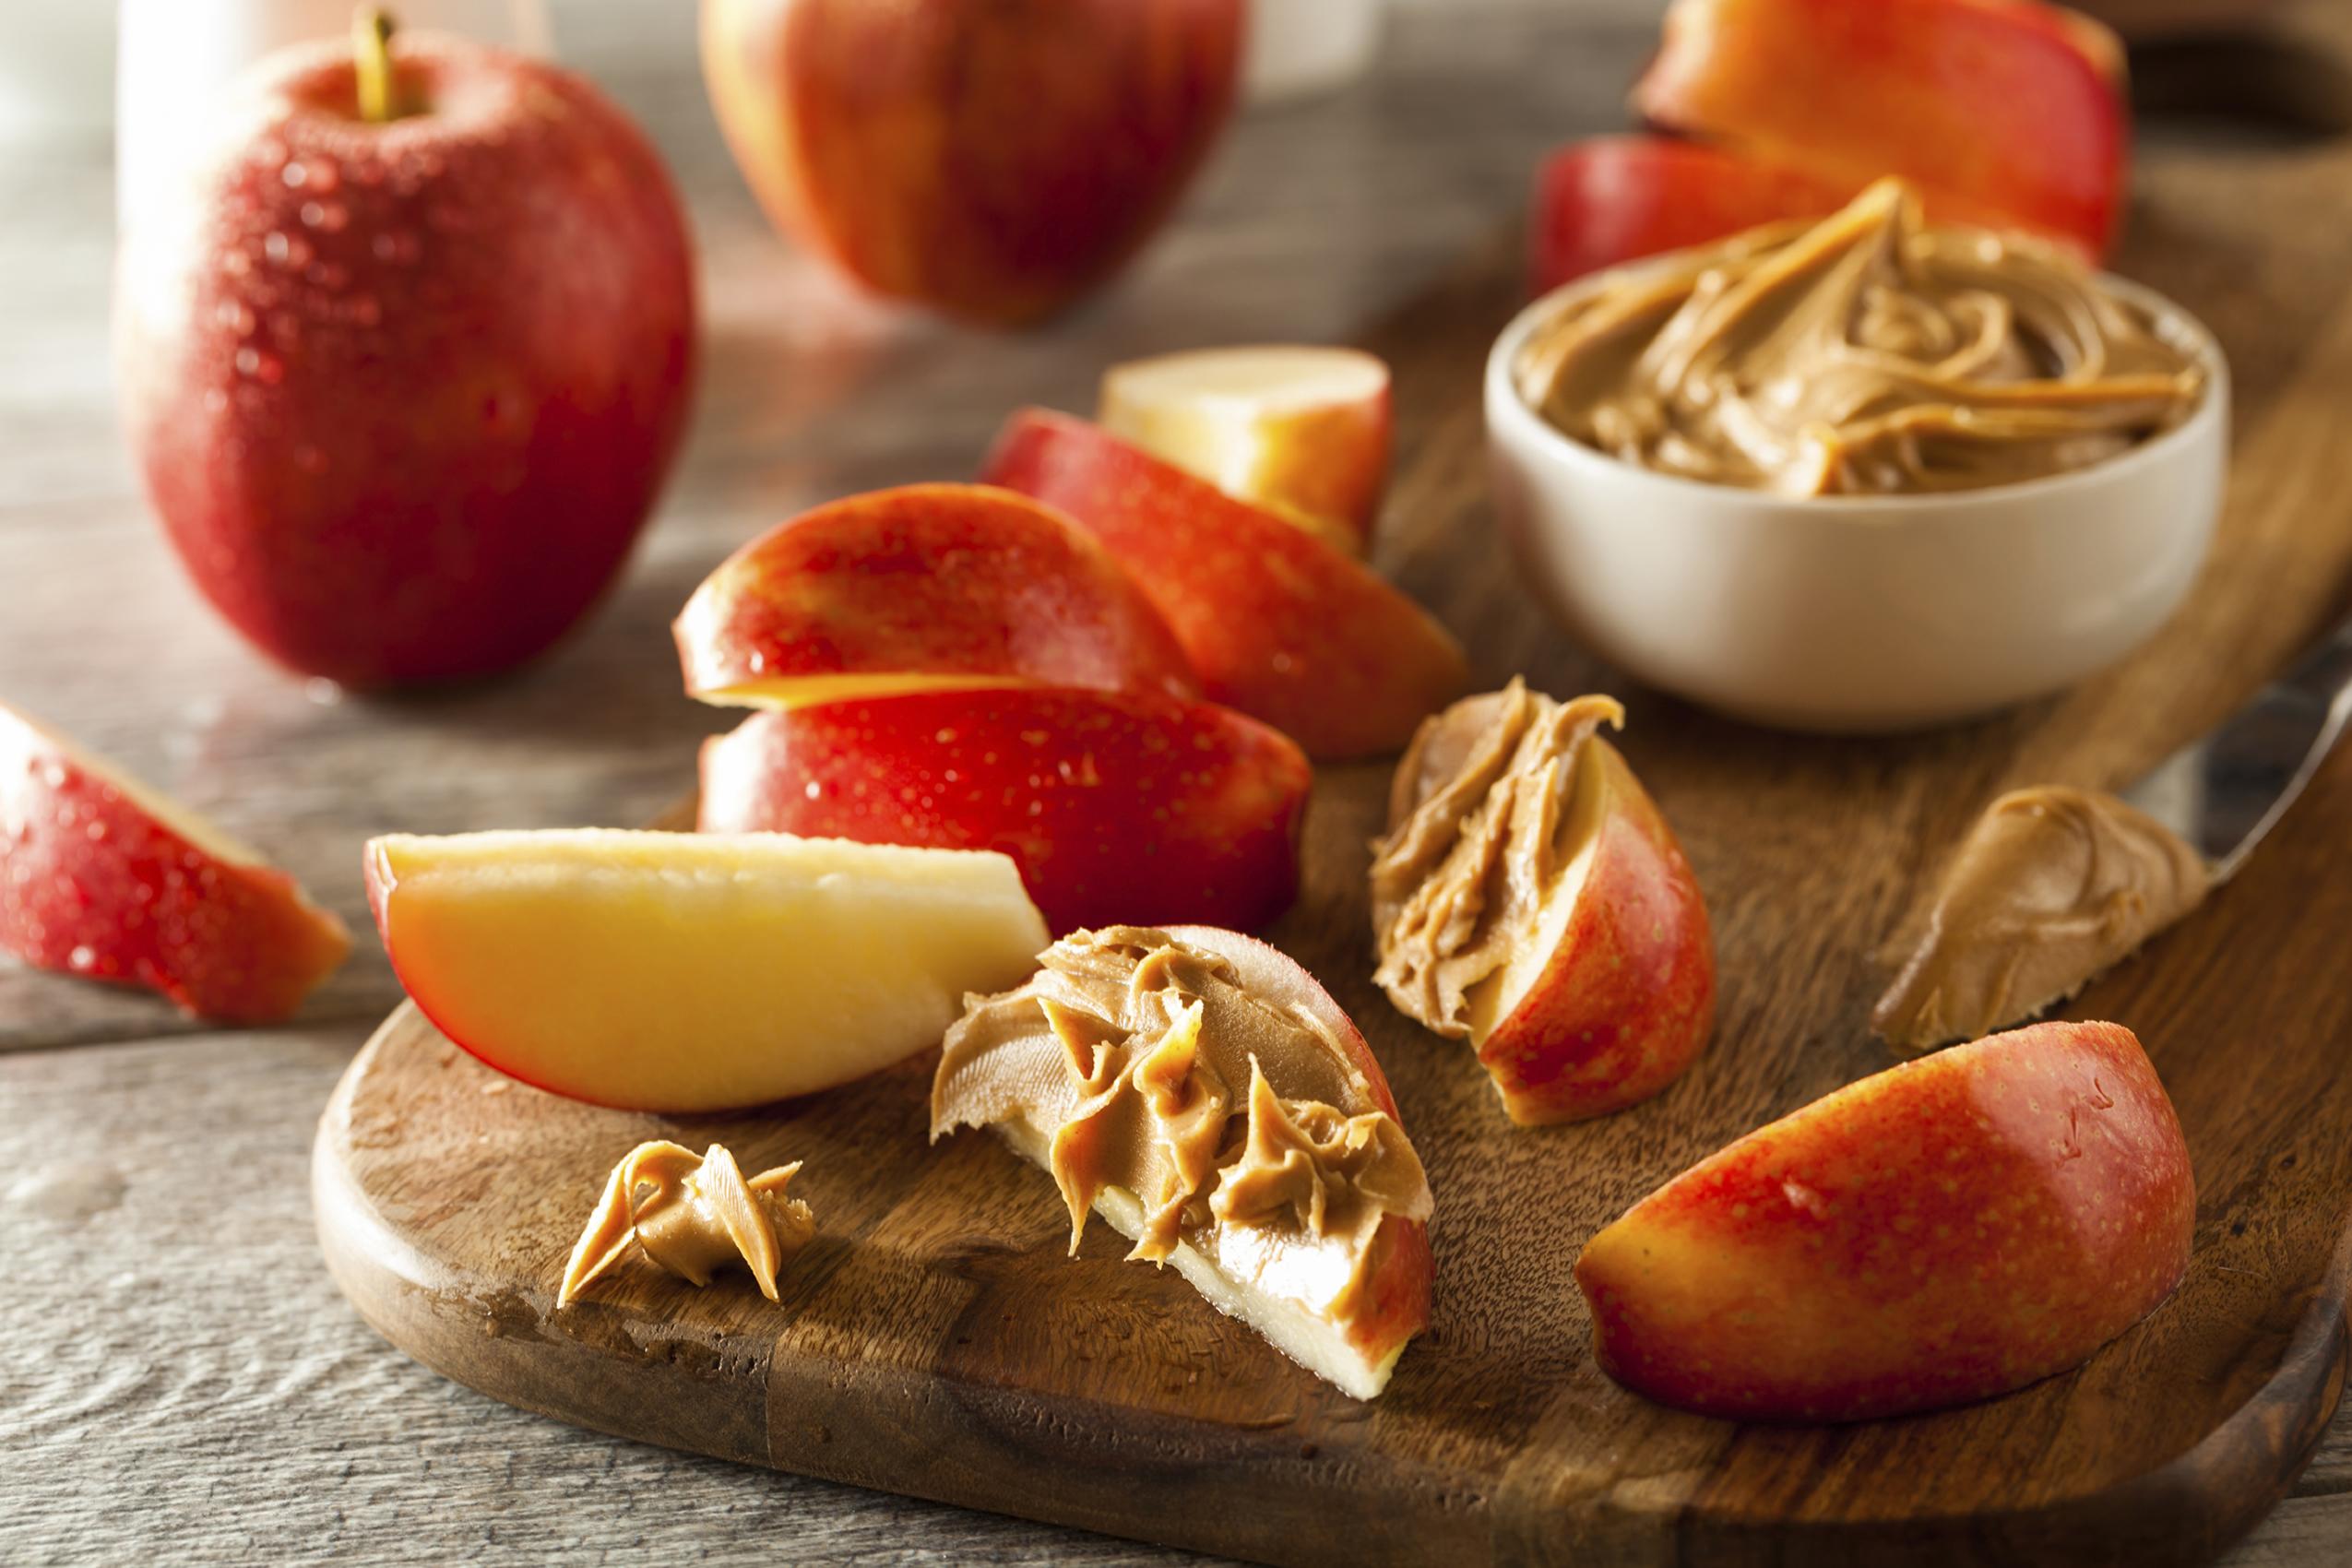 Peanut Butter Spread on Apple Slices